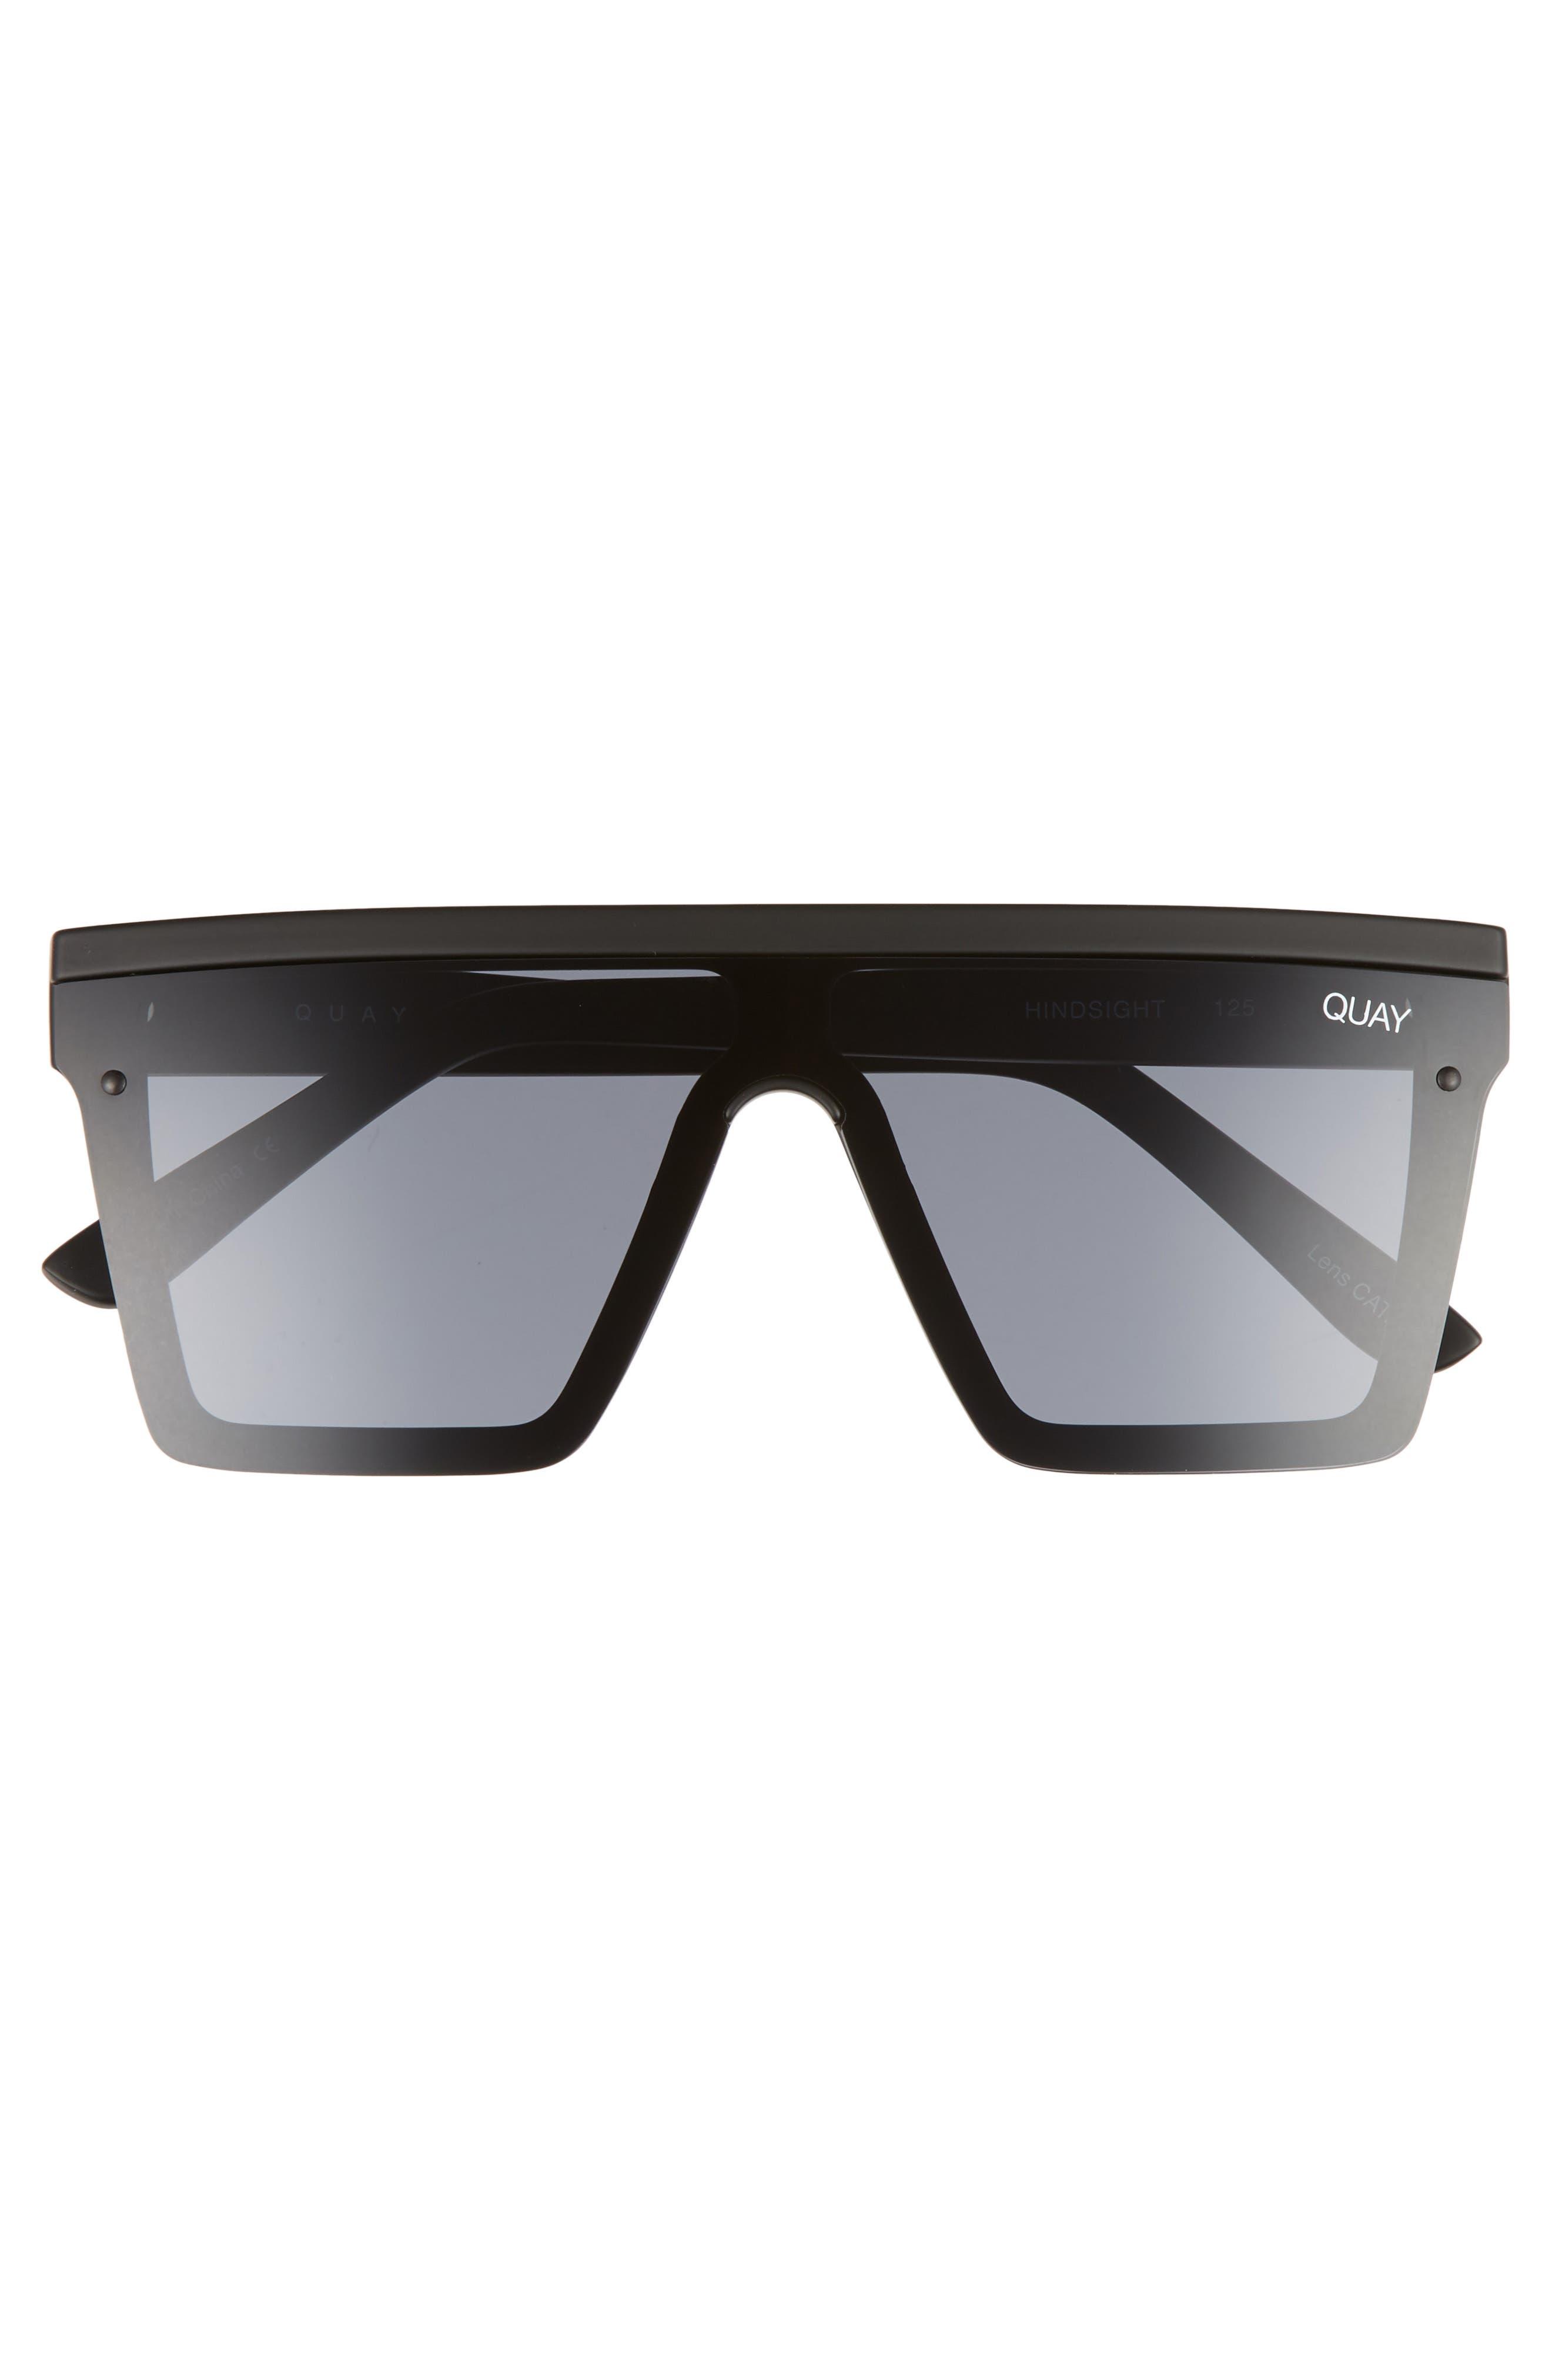 Hindsight 67mm Shield Sunglasses,                             Alternate thumbnail 4, color,                             Black/ Smoke